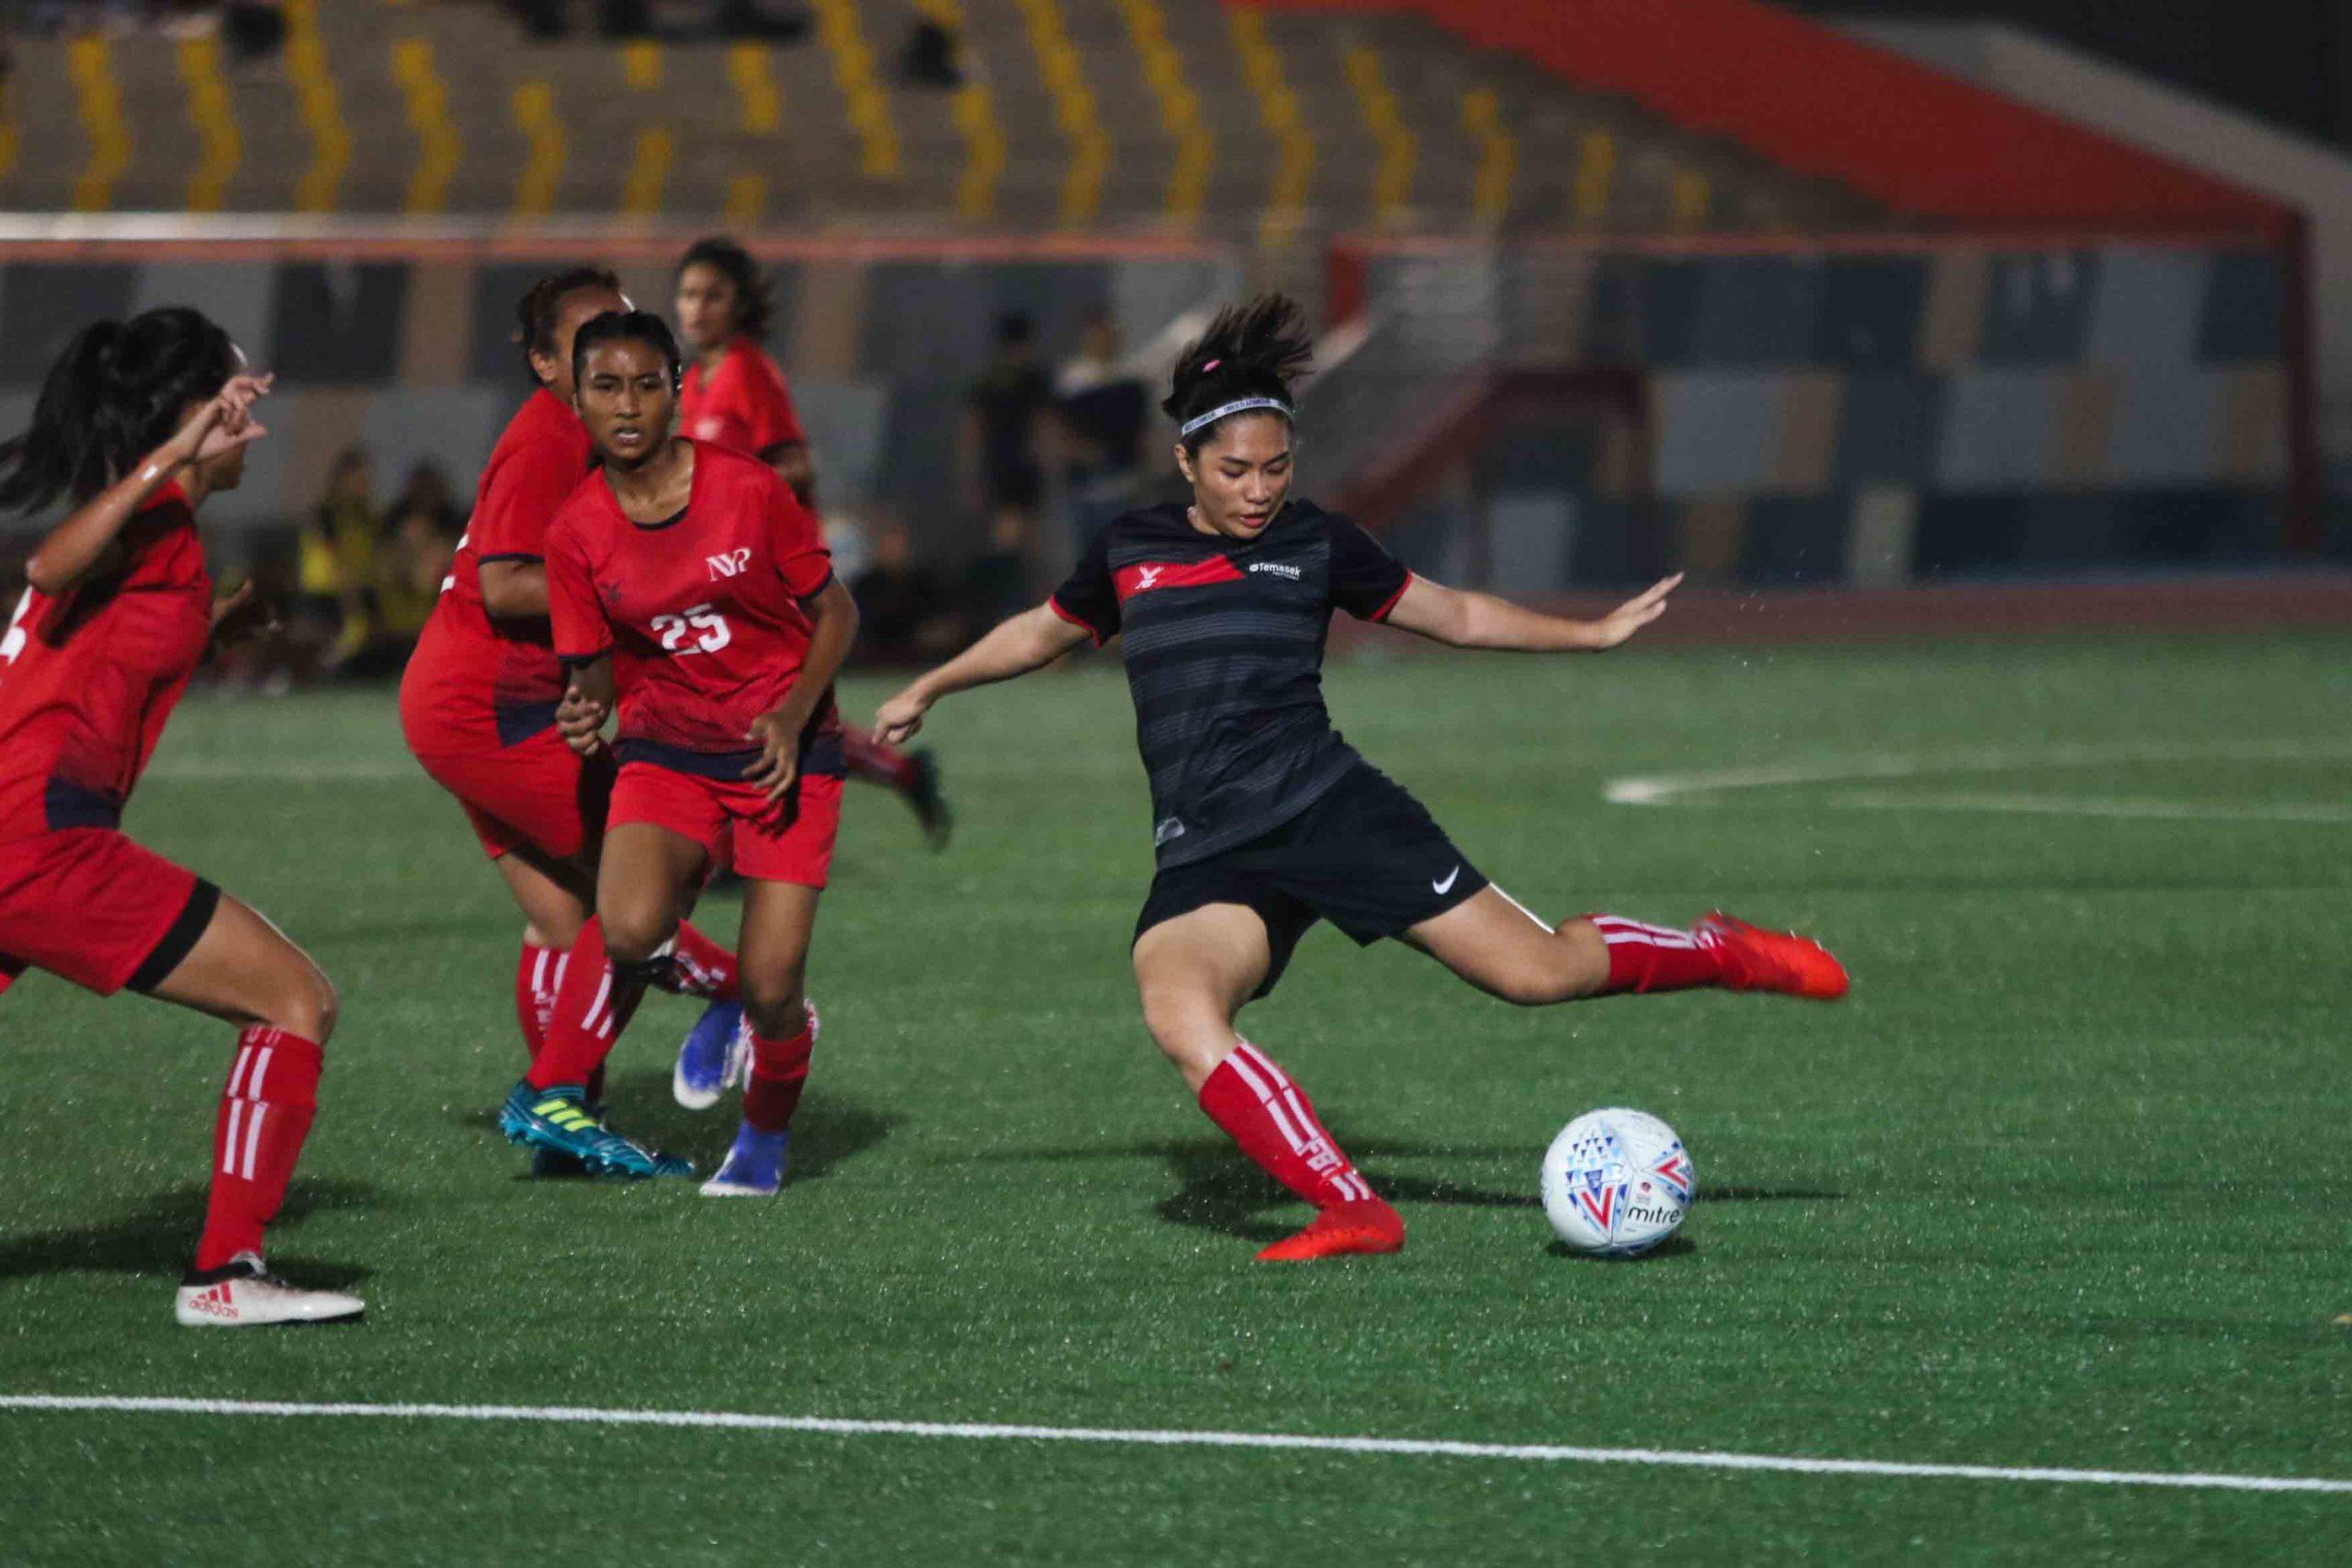 Stephanie Gigette A Dominguez (TP #4) takes a shot on goal. (Photo 7 © Clara Lau/Red Sports)